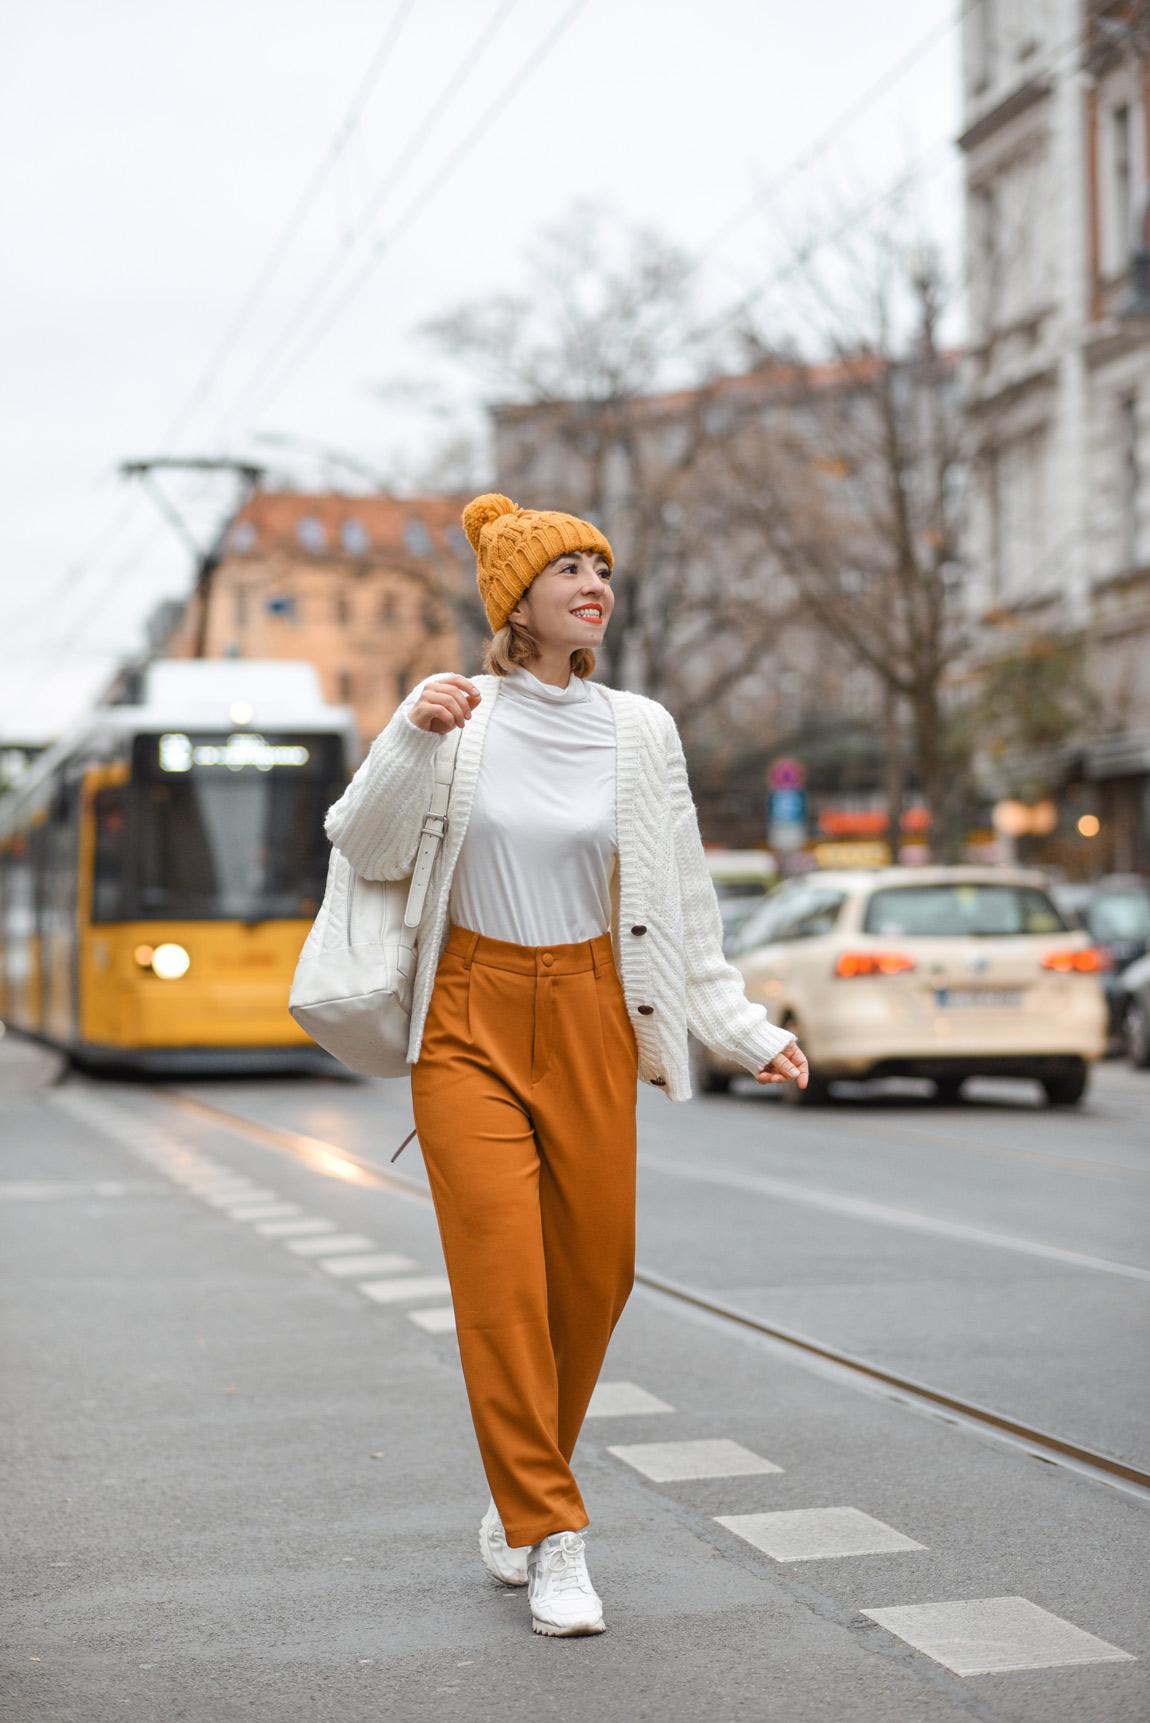 öffis, bvg, berlin, outfit, streetstyle, gelb, senfgelb, fashionblogger, lifestyleblogger, modeblogger, outfit, trambahn